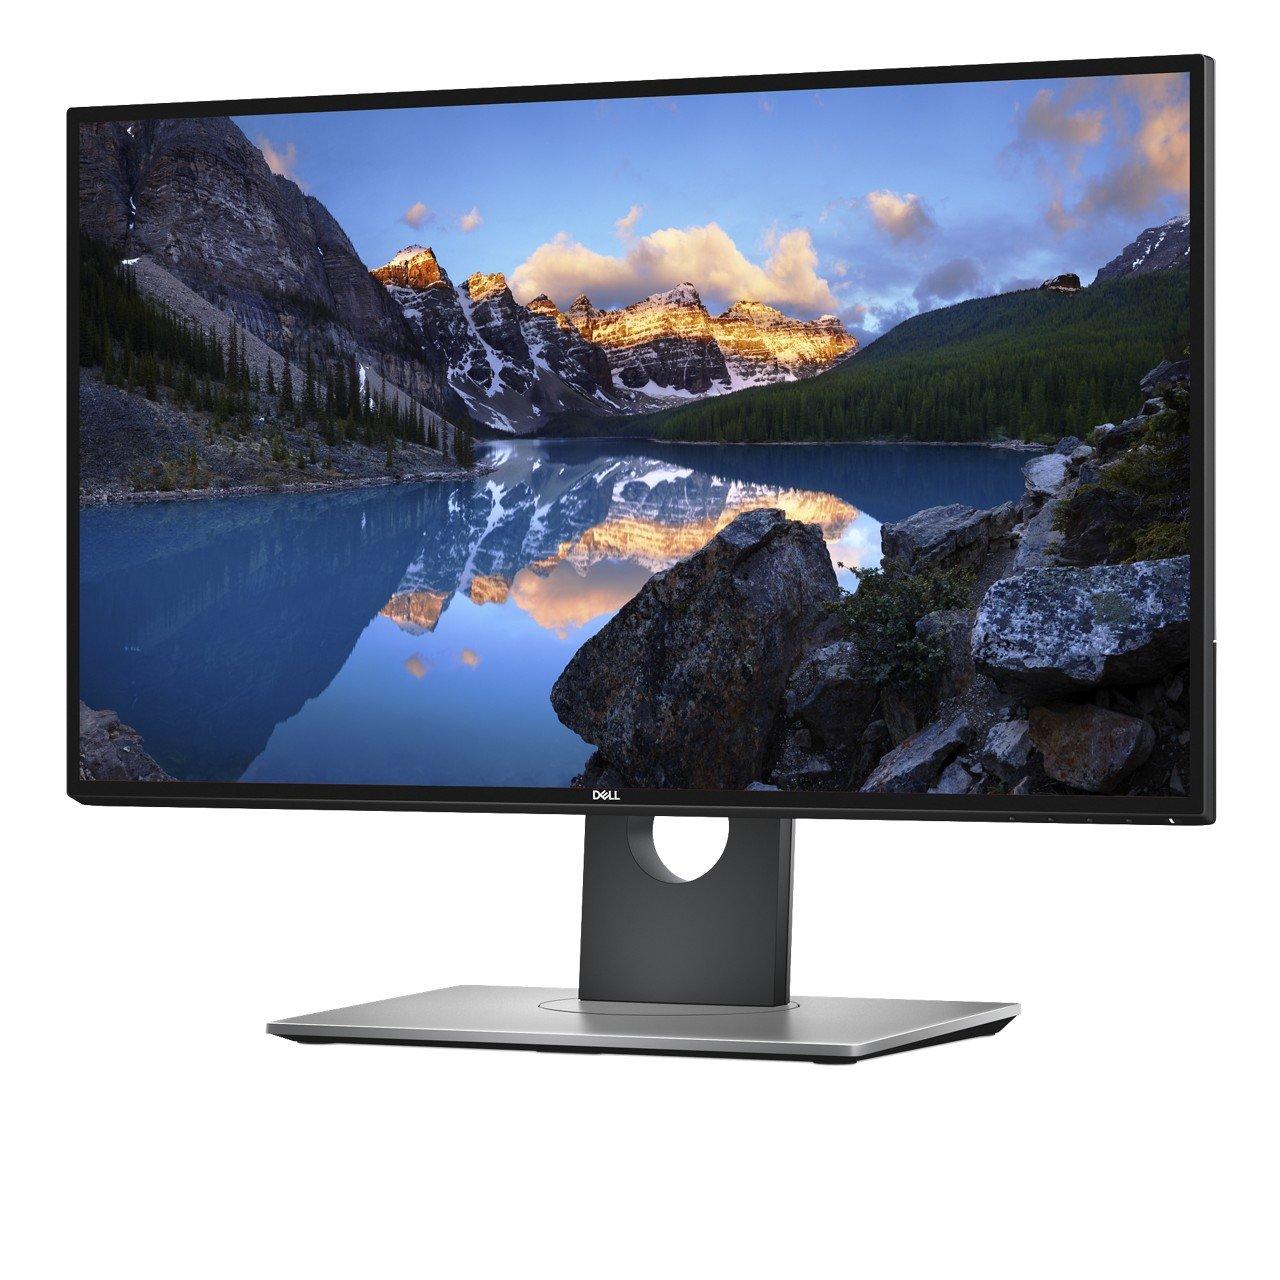 Dell Ultra Sharp LED-Lit Monitor 25'' Black (U2518D)  2560 X 1440 at 60 Hz  IPS  Vesa Mount Compatibility